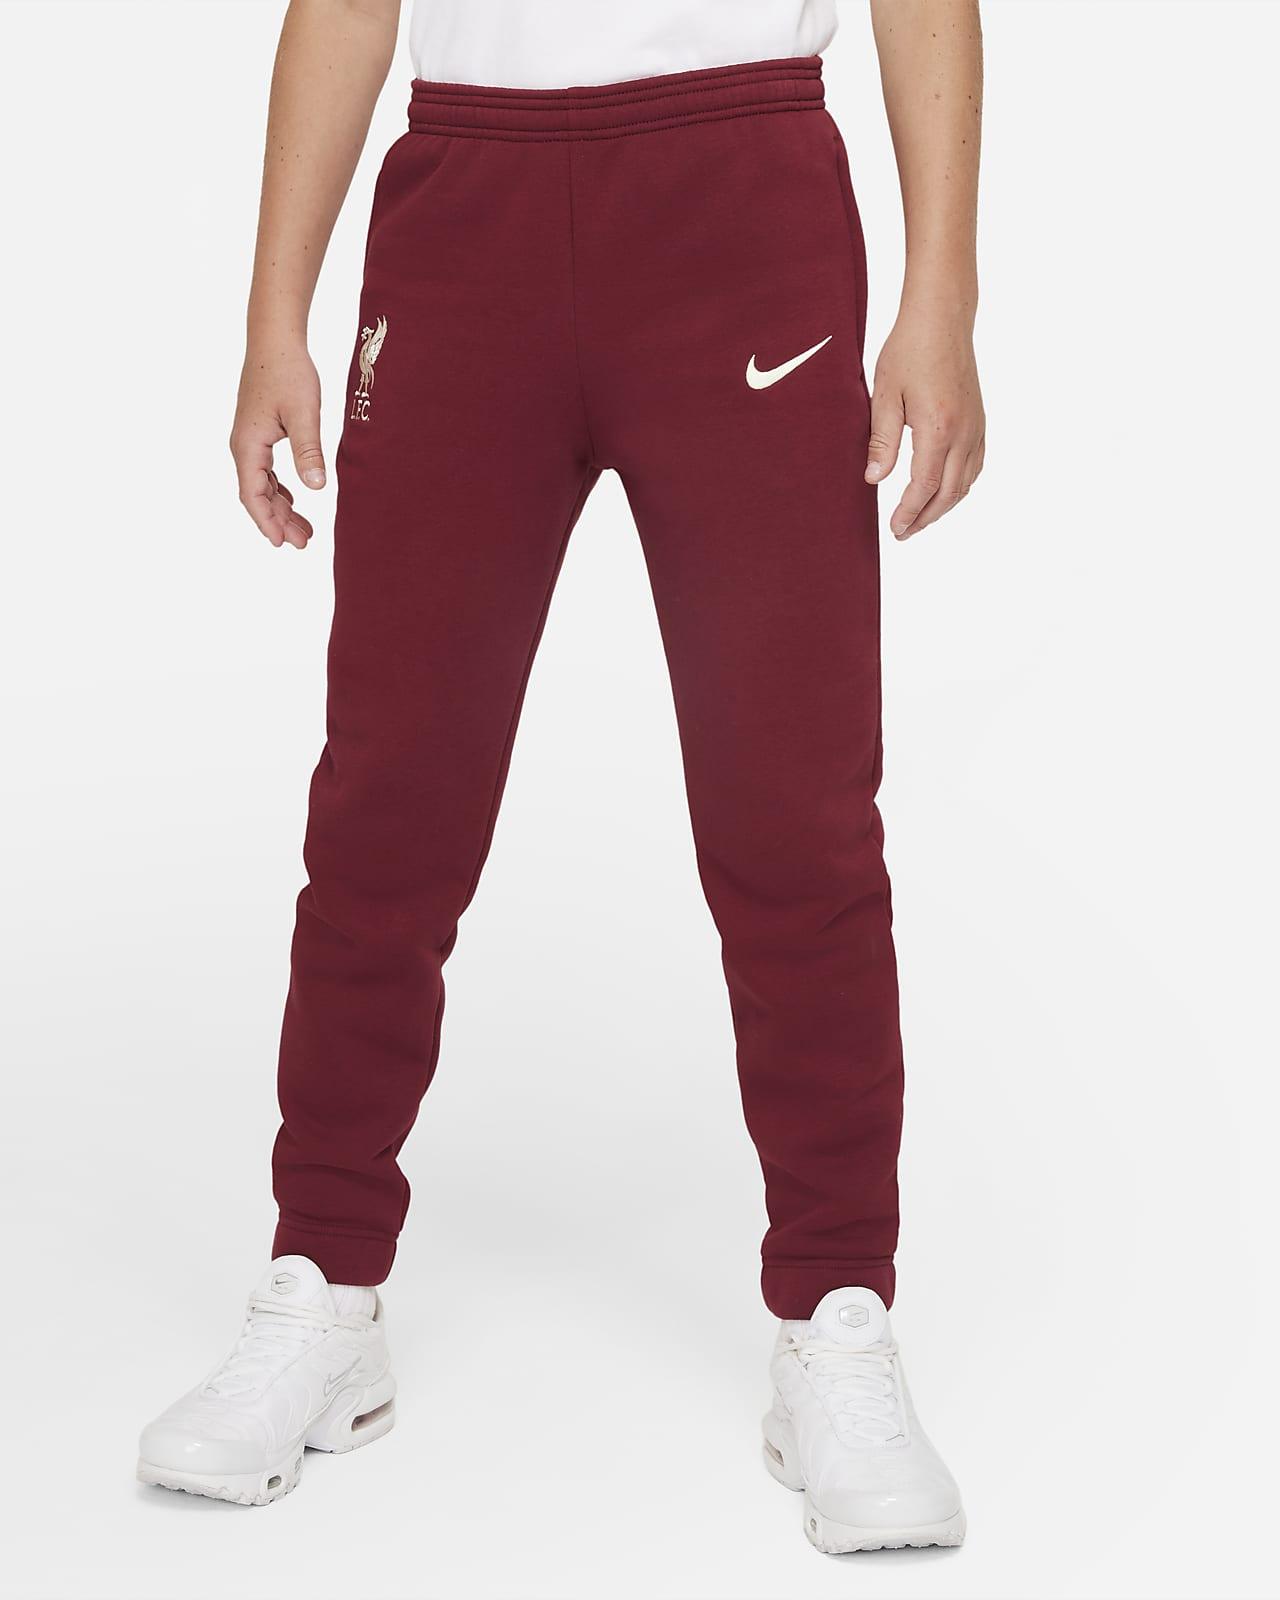 Liverpool F.C. Older Kids' Fleece Football Pants